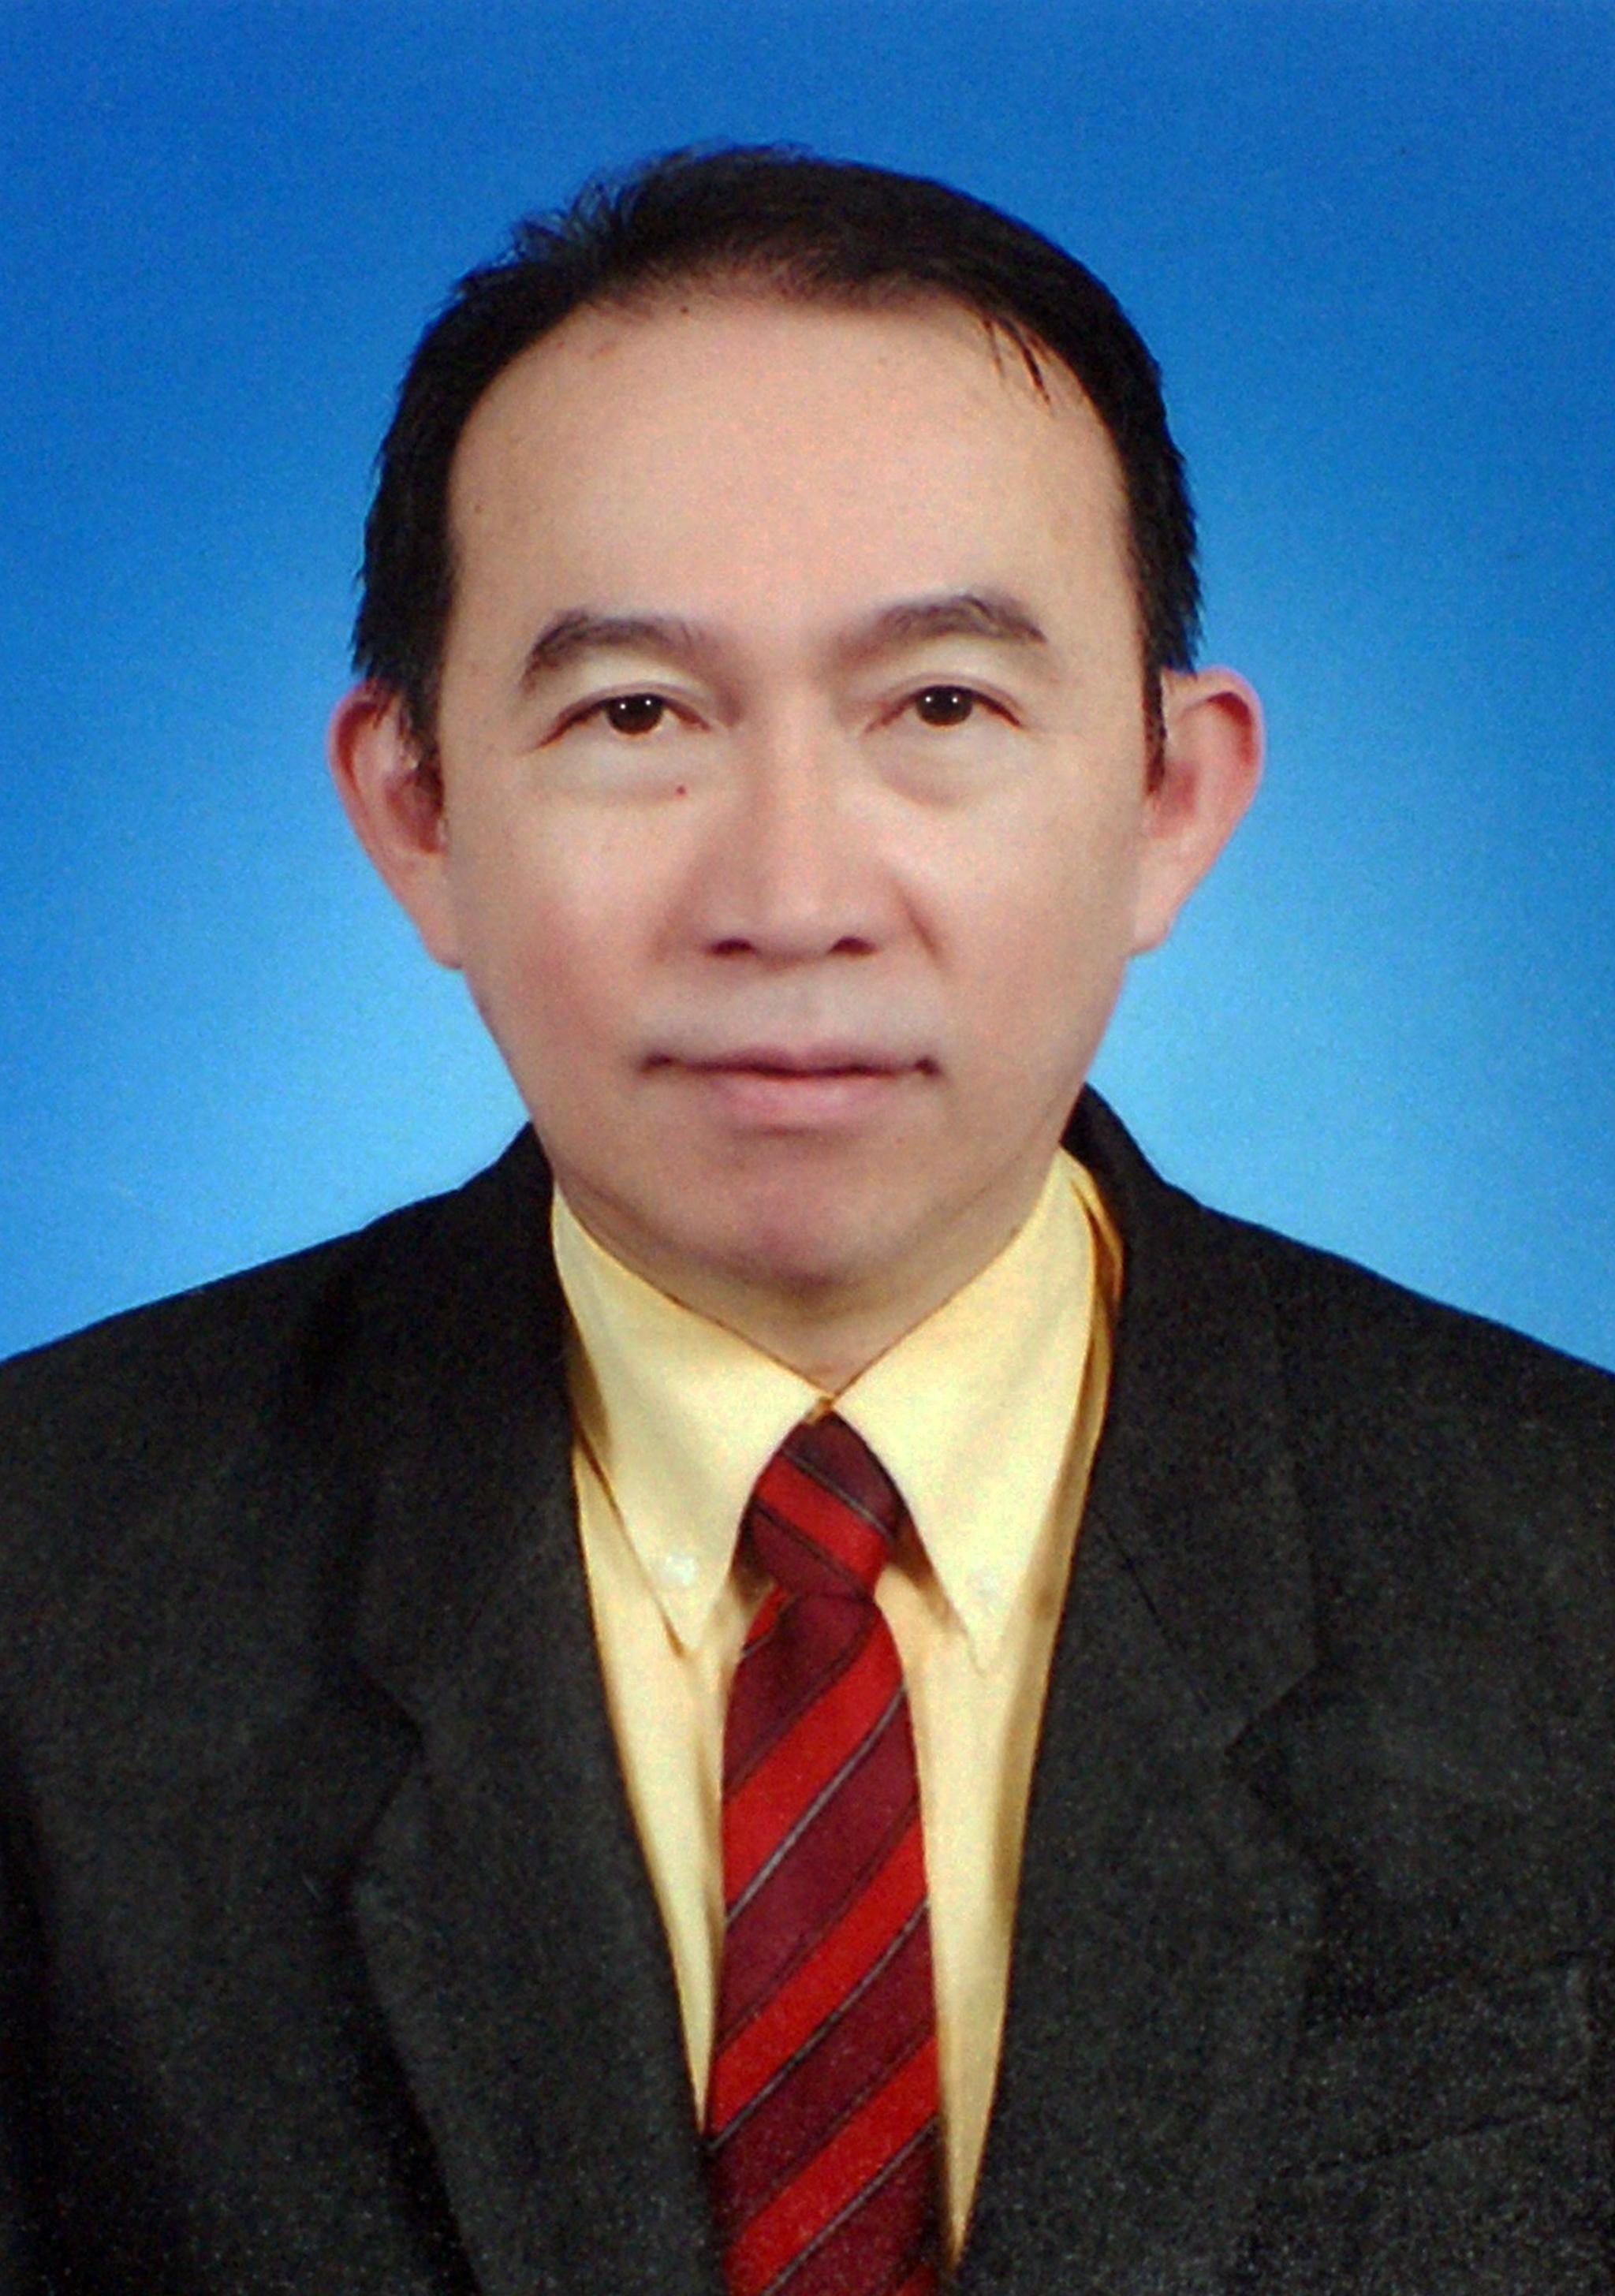 Attapon Cheepsattayakorn